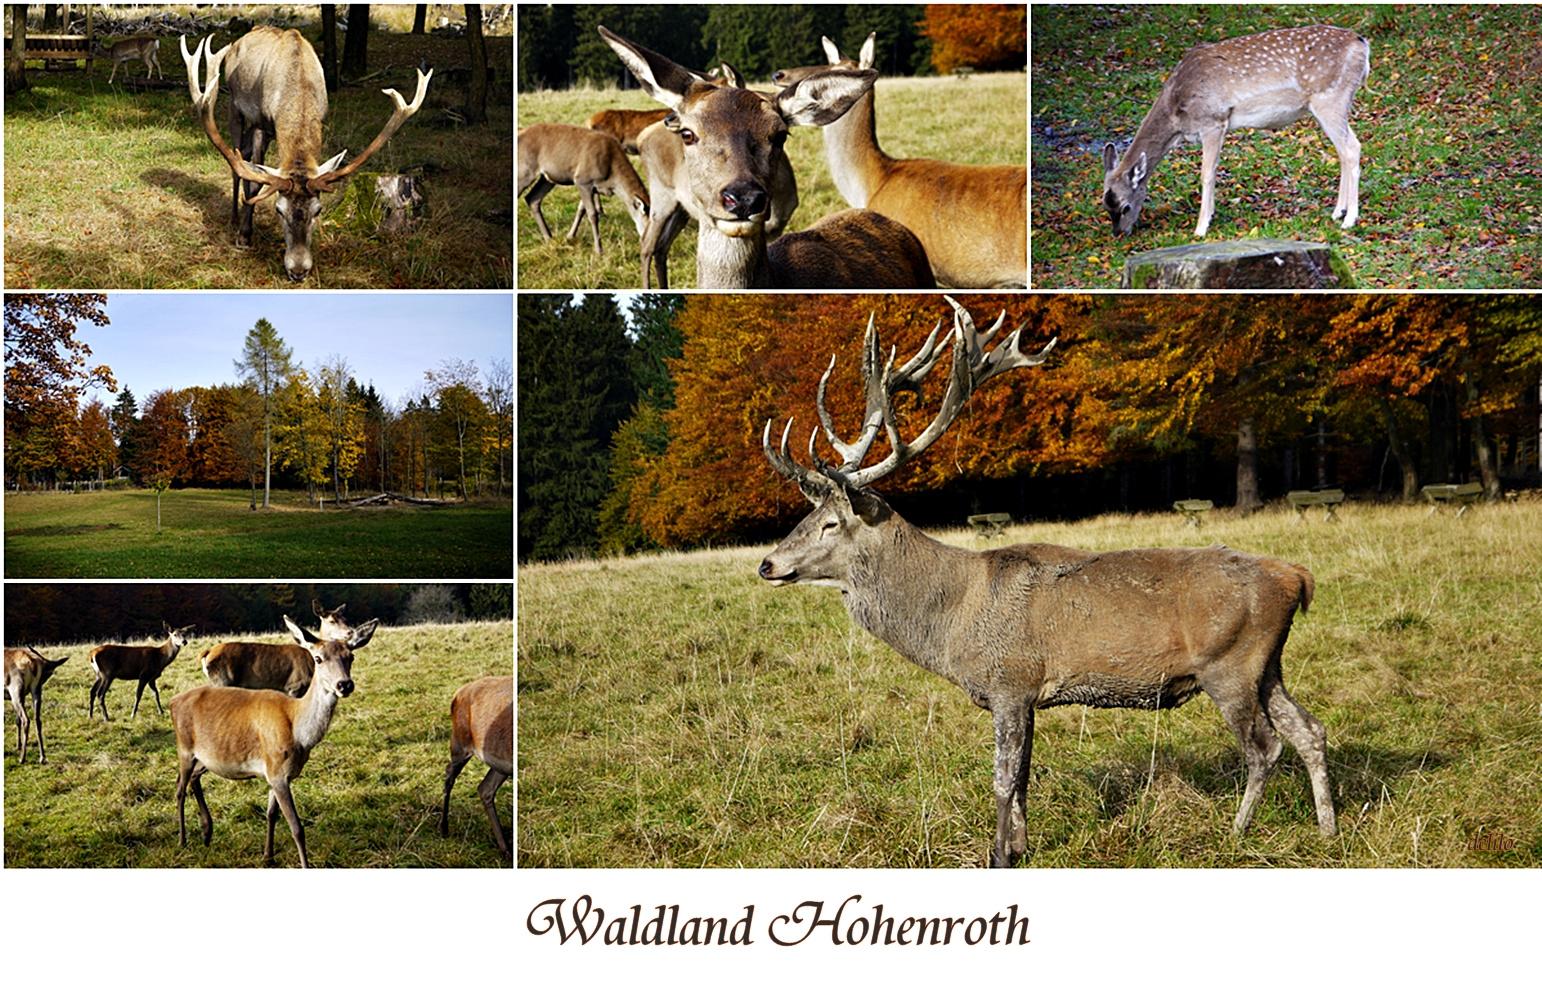 Waldland Hohenroth